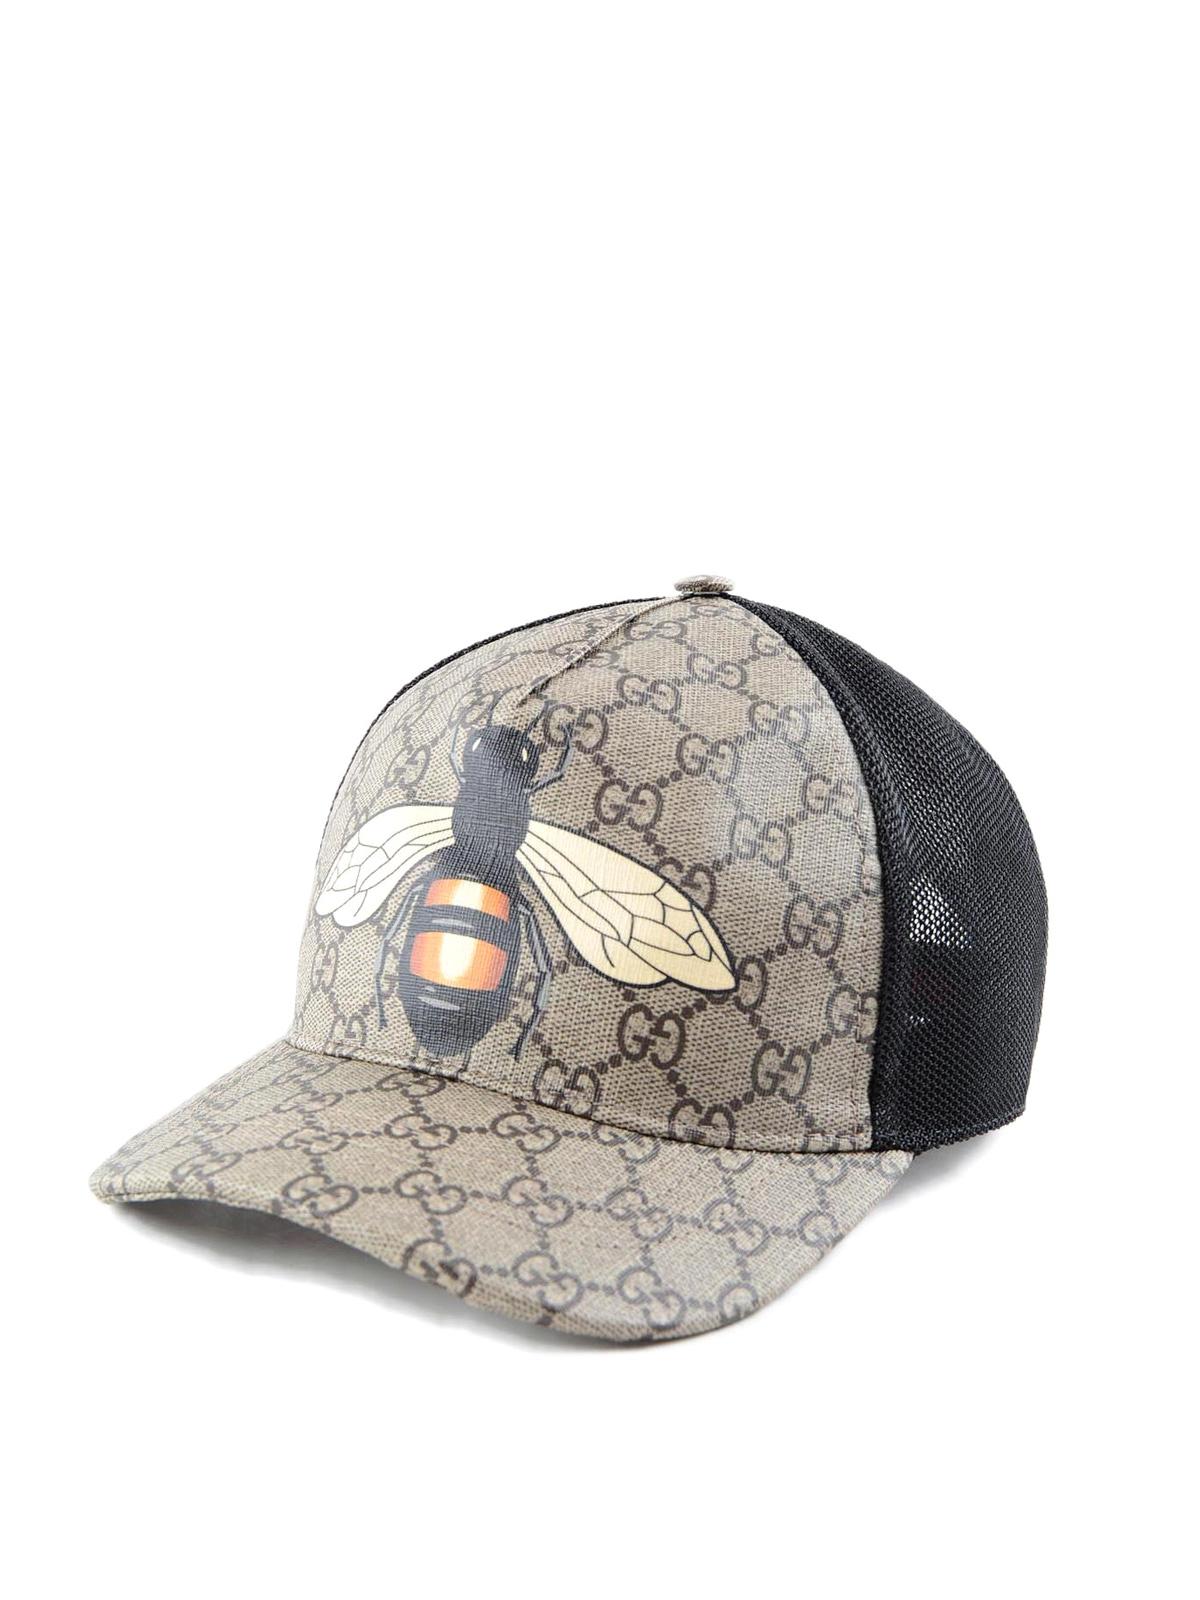 deee3751cdf0b Gucci - Bee print GG Supreme baseball hat - کلاه - 426887 4HB12 2160